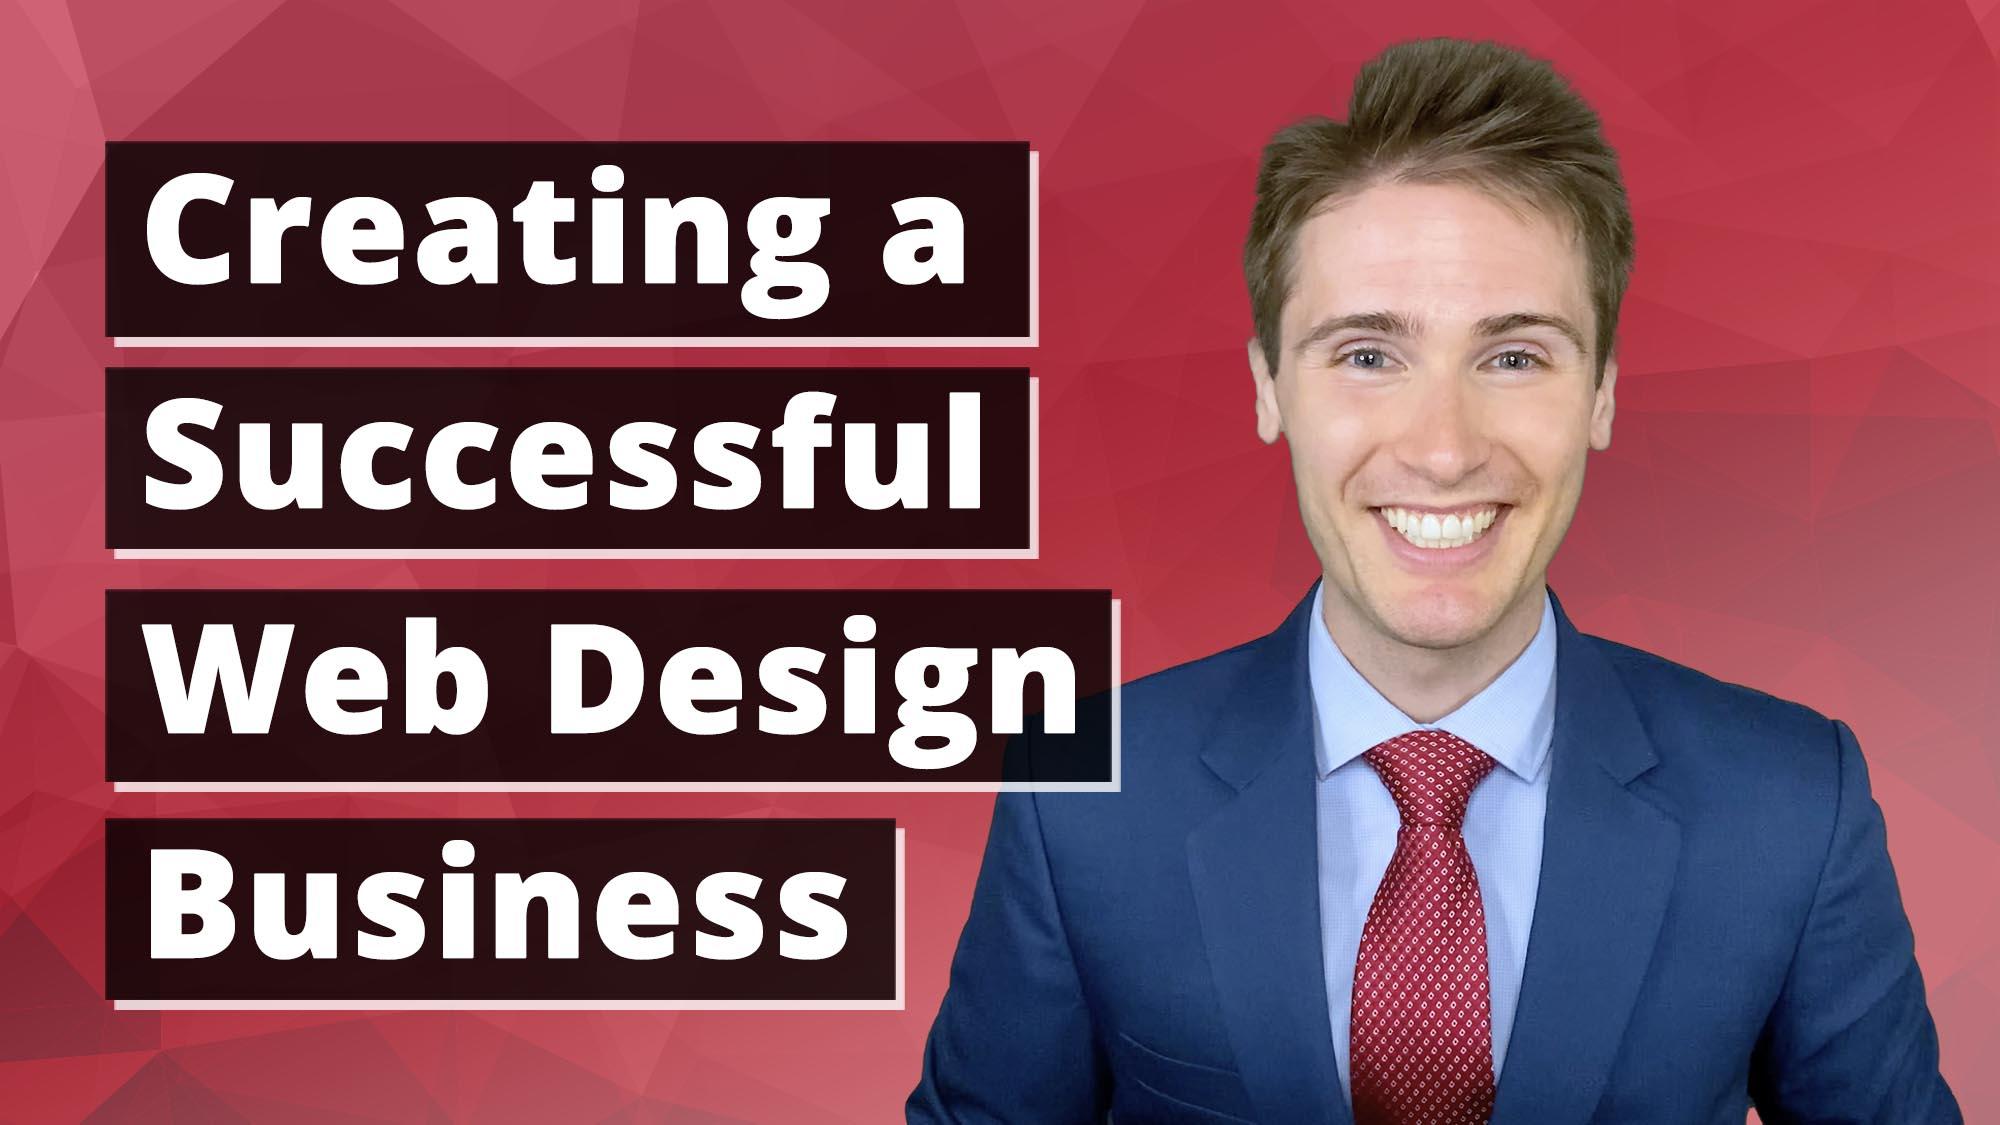 Creating a Successful Web Design Business